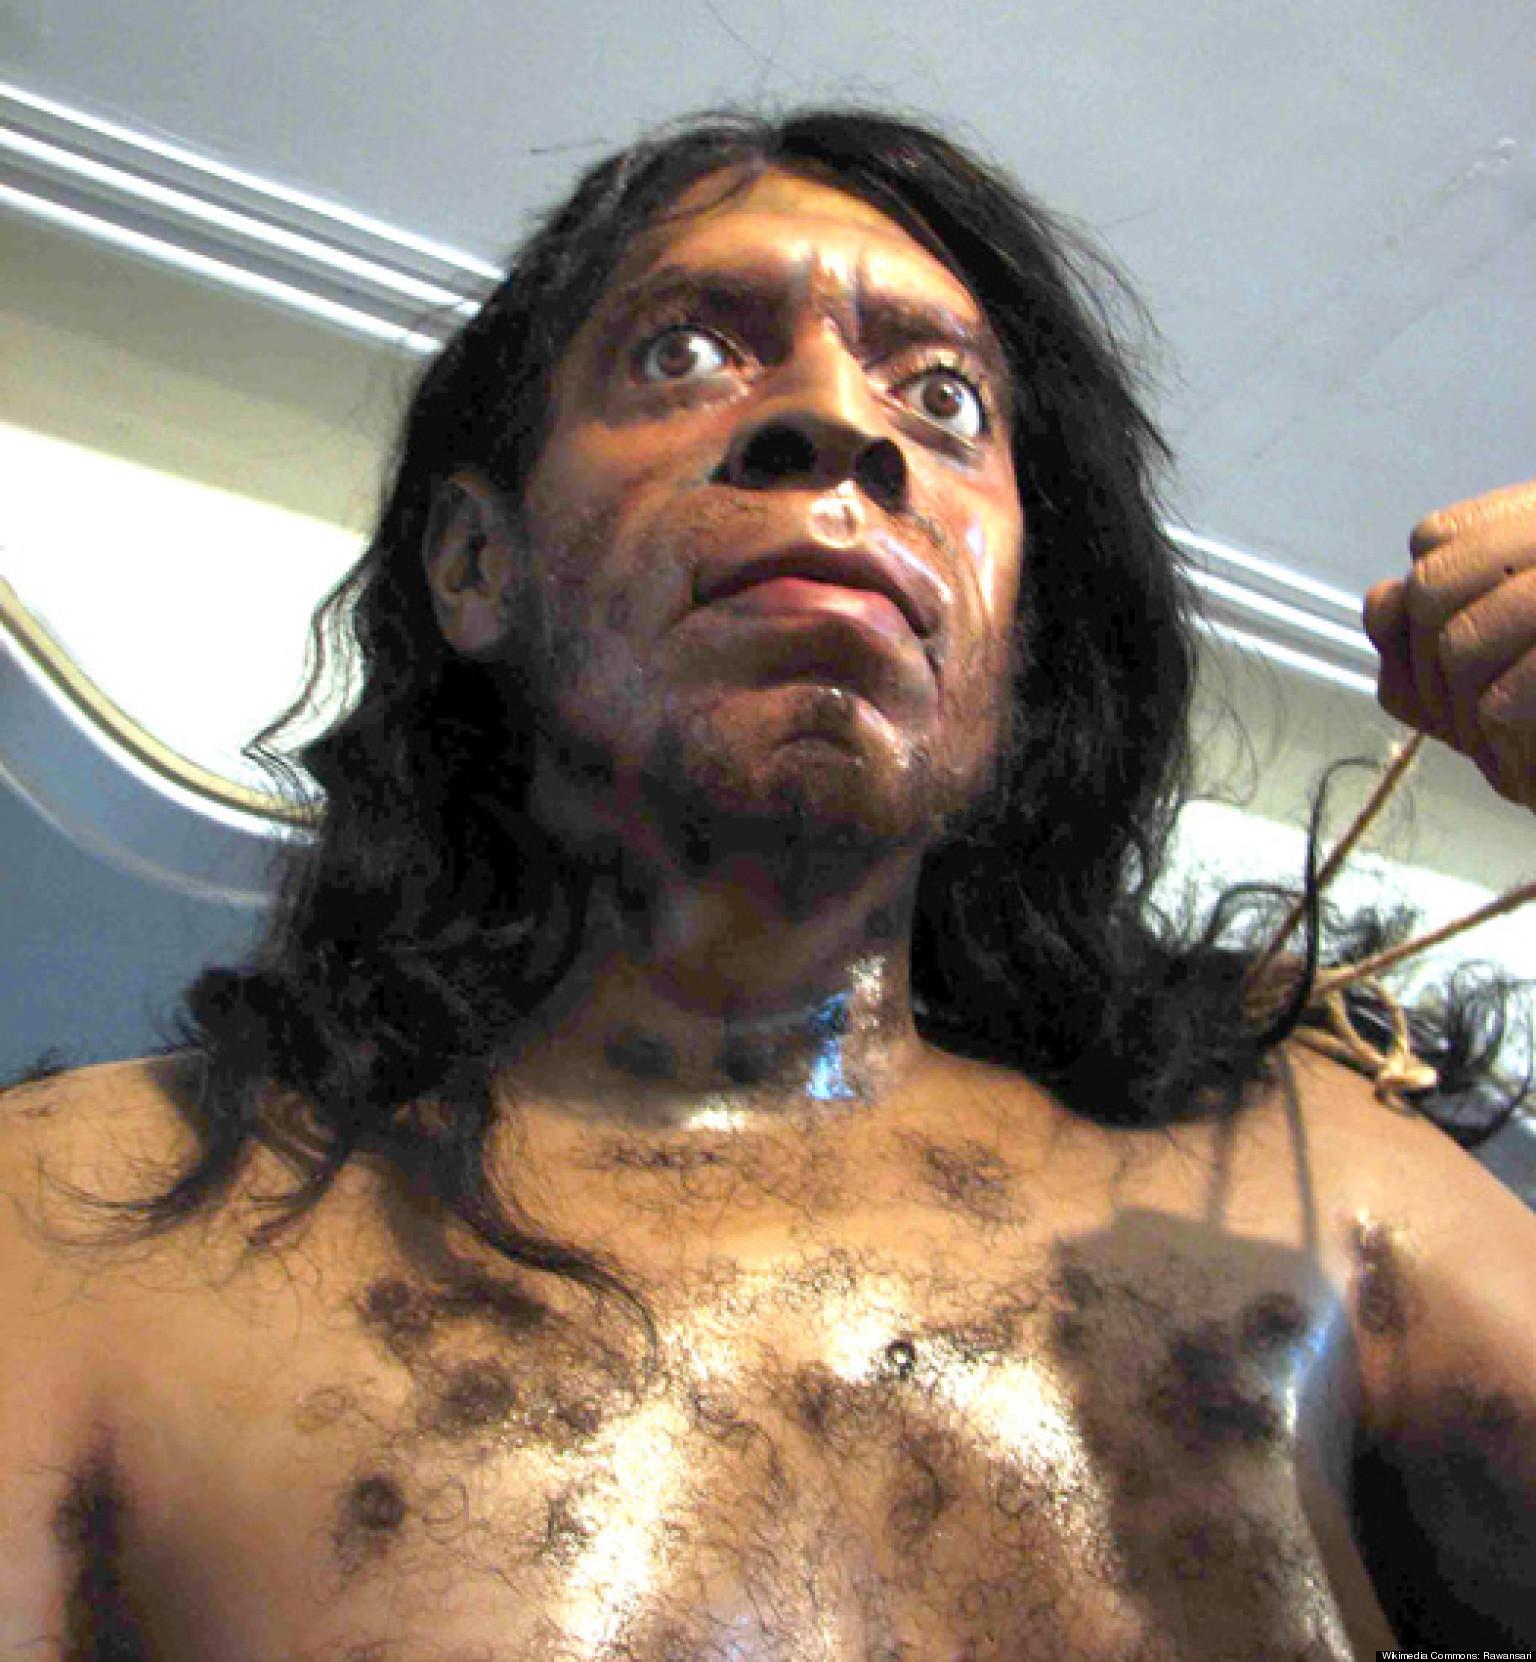 Caveman Modern Man : Caveman diet stone age humans ate less meat than